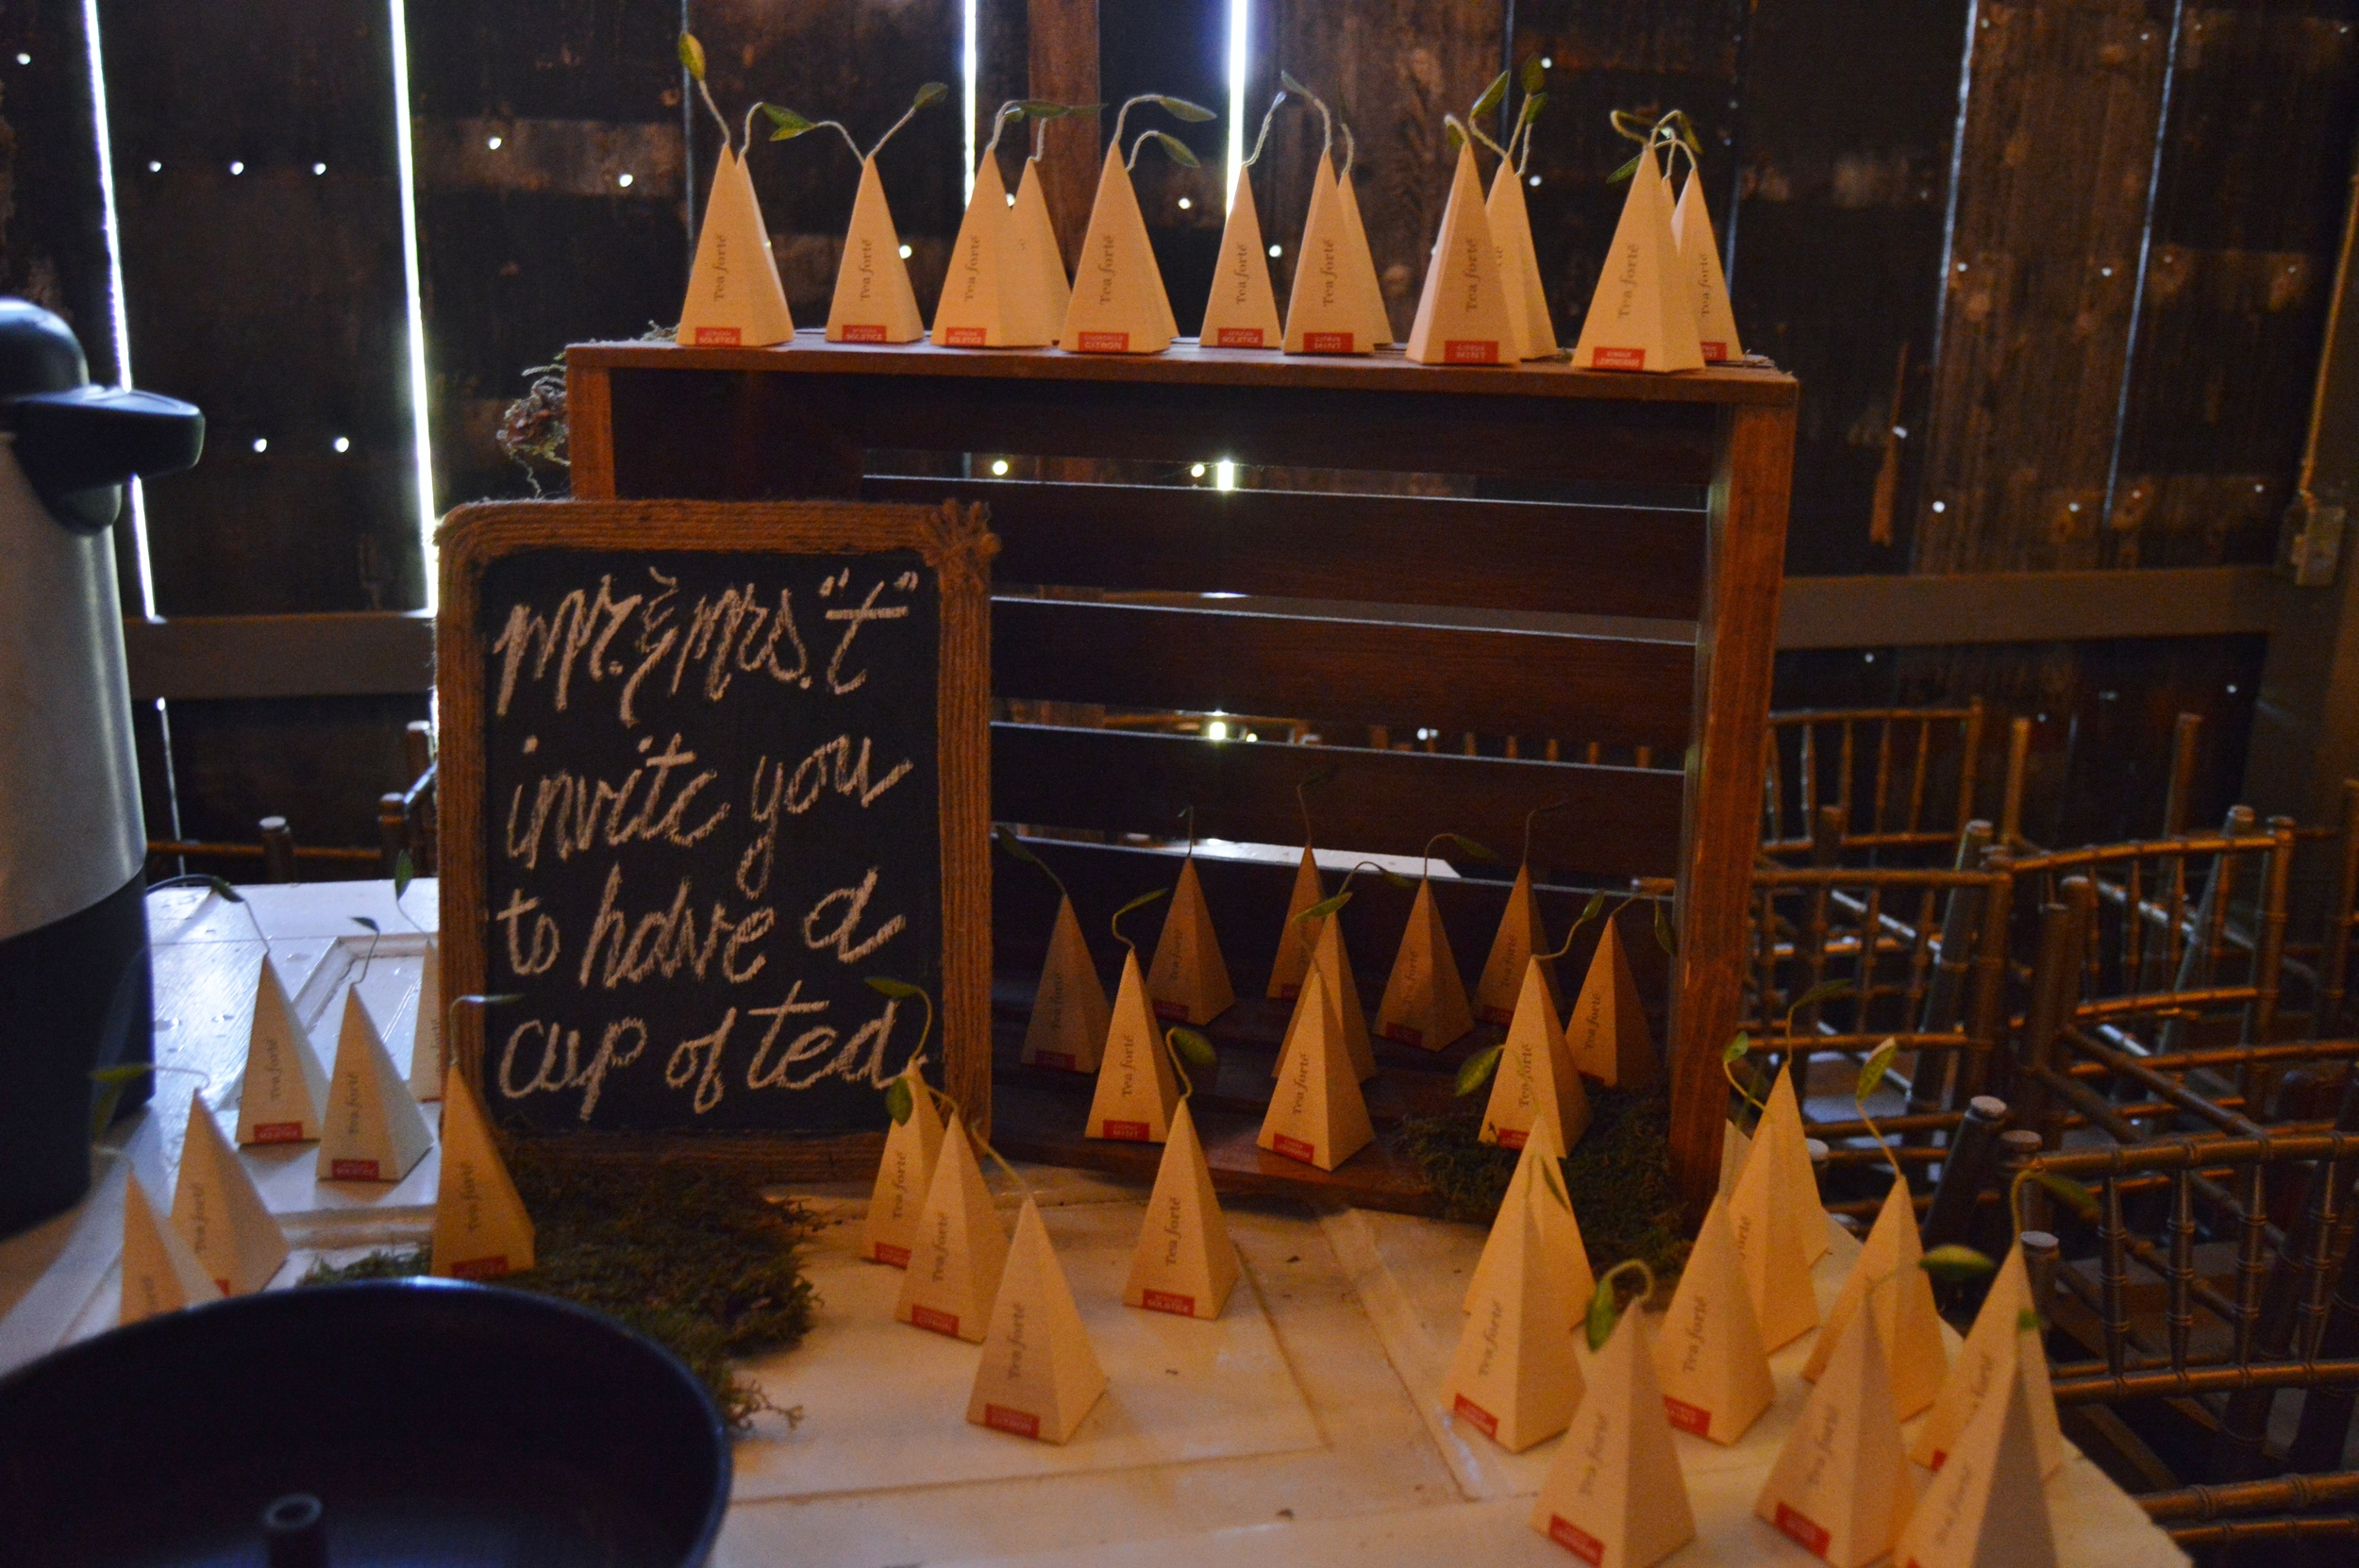 Kelsey + Gueorgui 's wedding also had a cute tea bar!